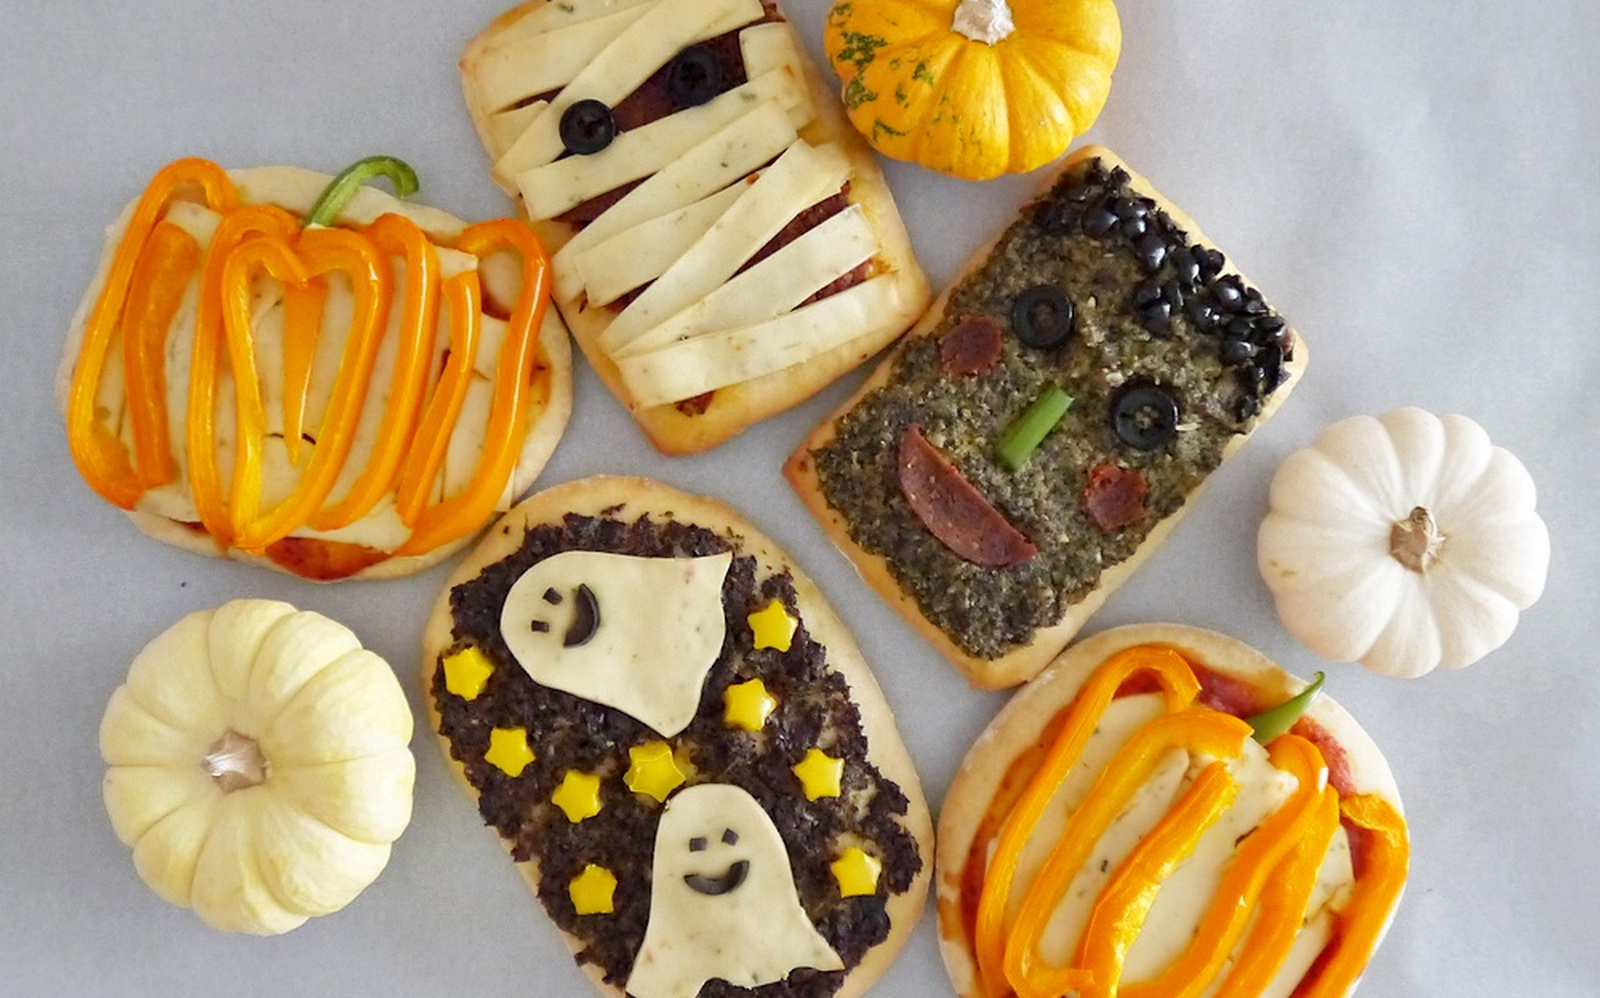 Spooky Scary Mini Halloween Pizzas [Vegan]